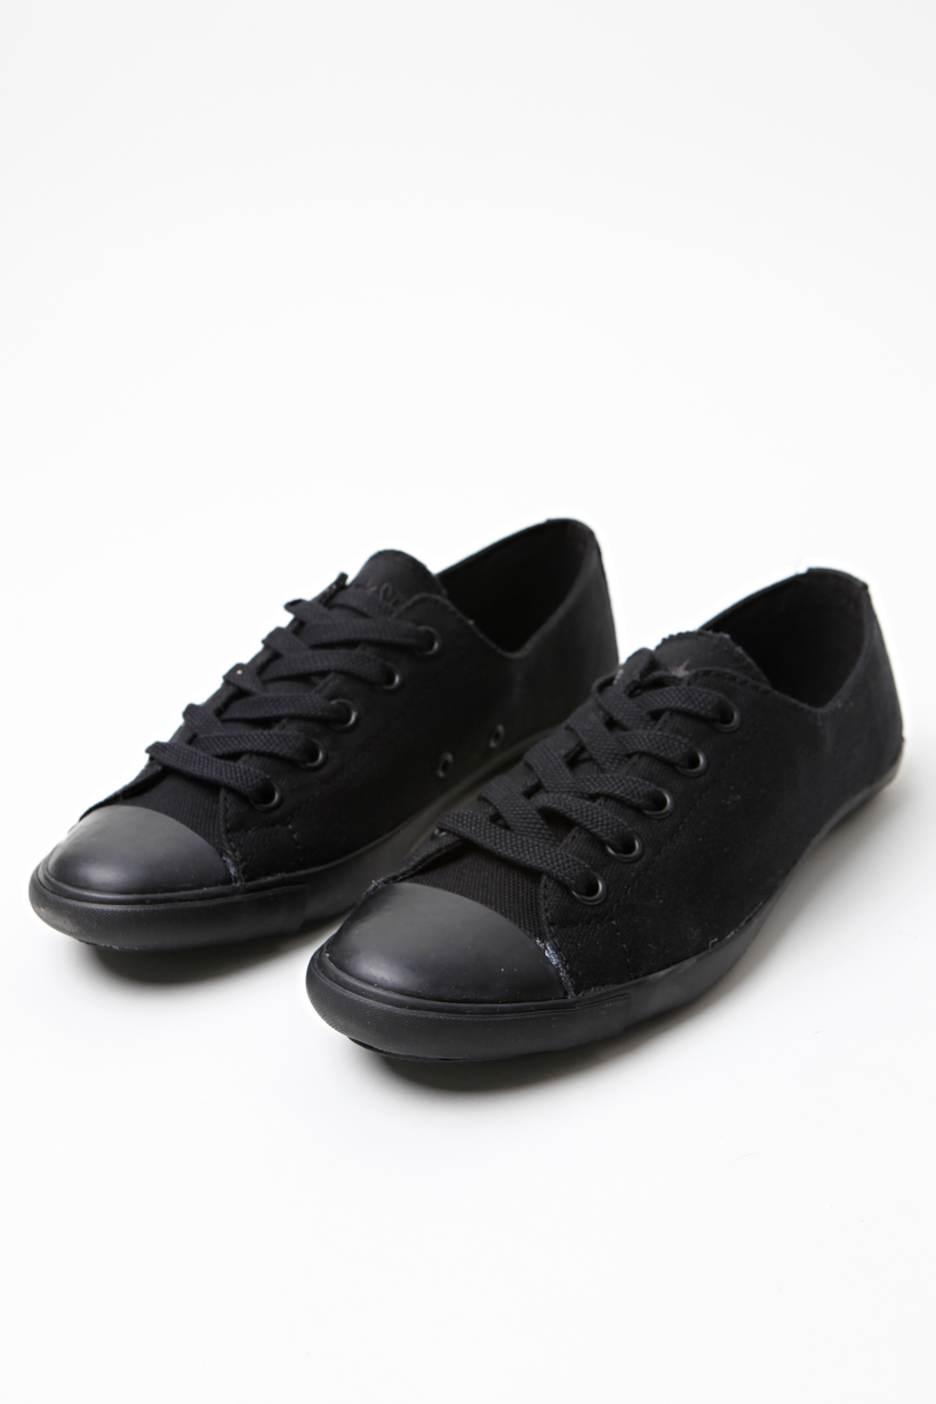 Converse - AS Light OX Black Black - Girl Shoes ...